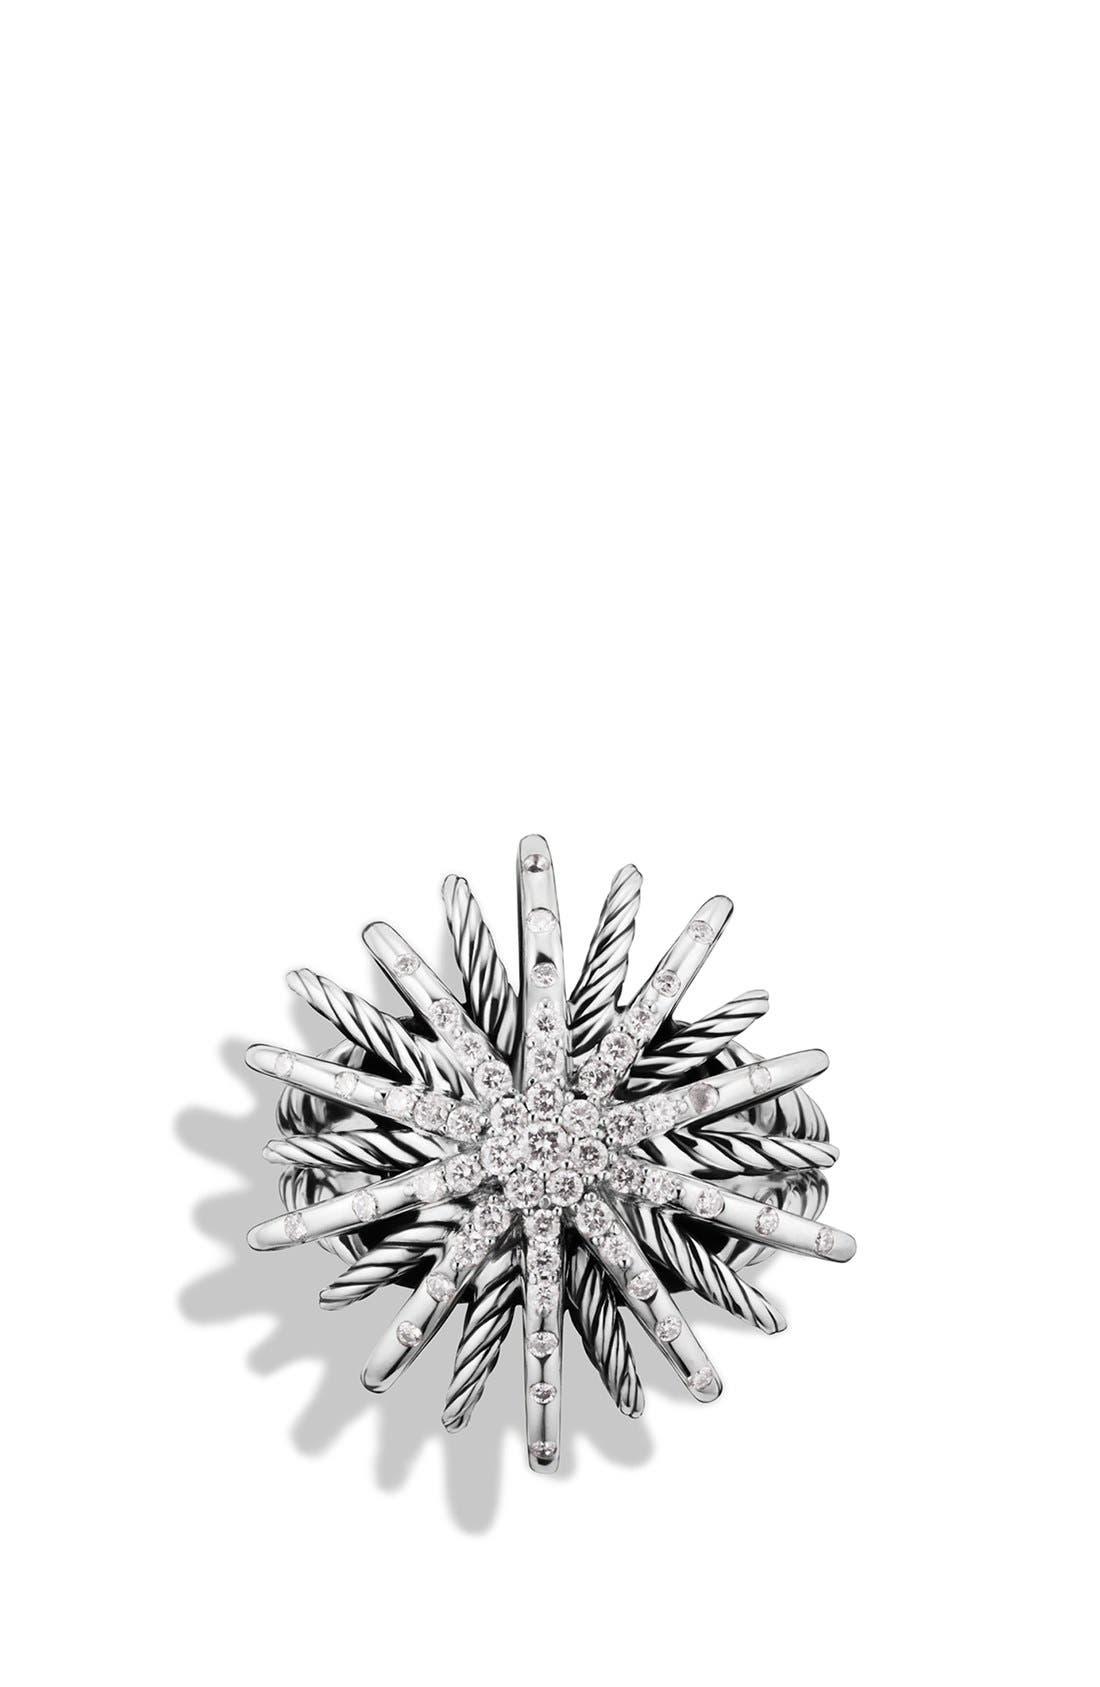 Alternate Image 3  - David Yurman 'Starburst' Ring with Diamonds